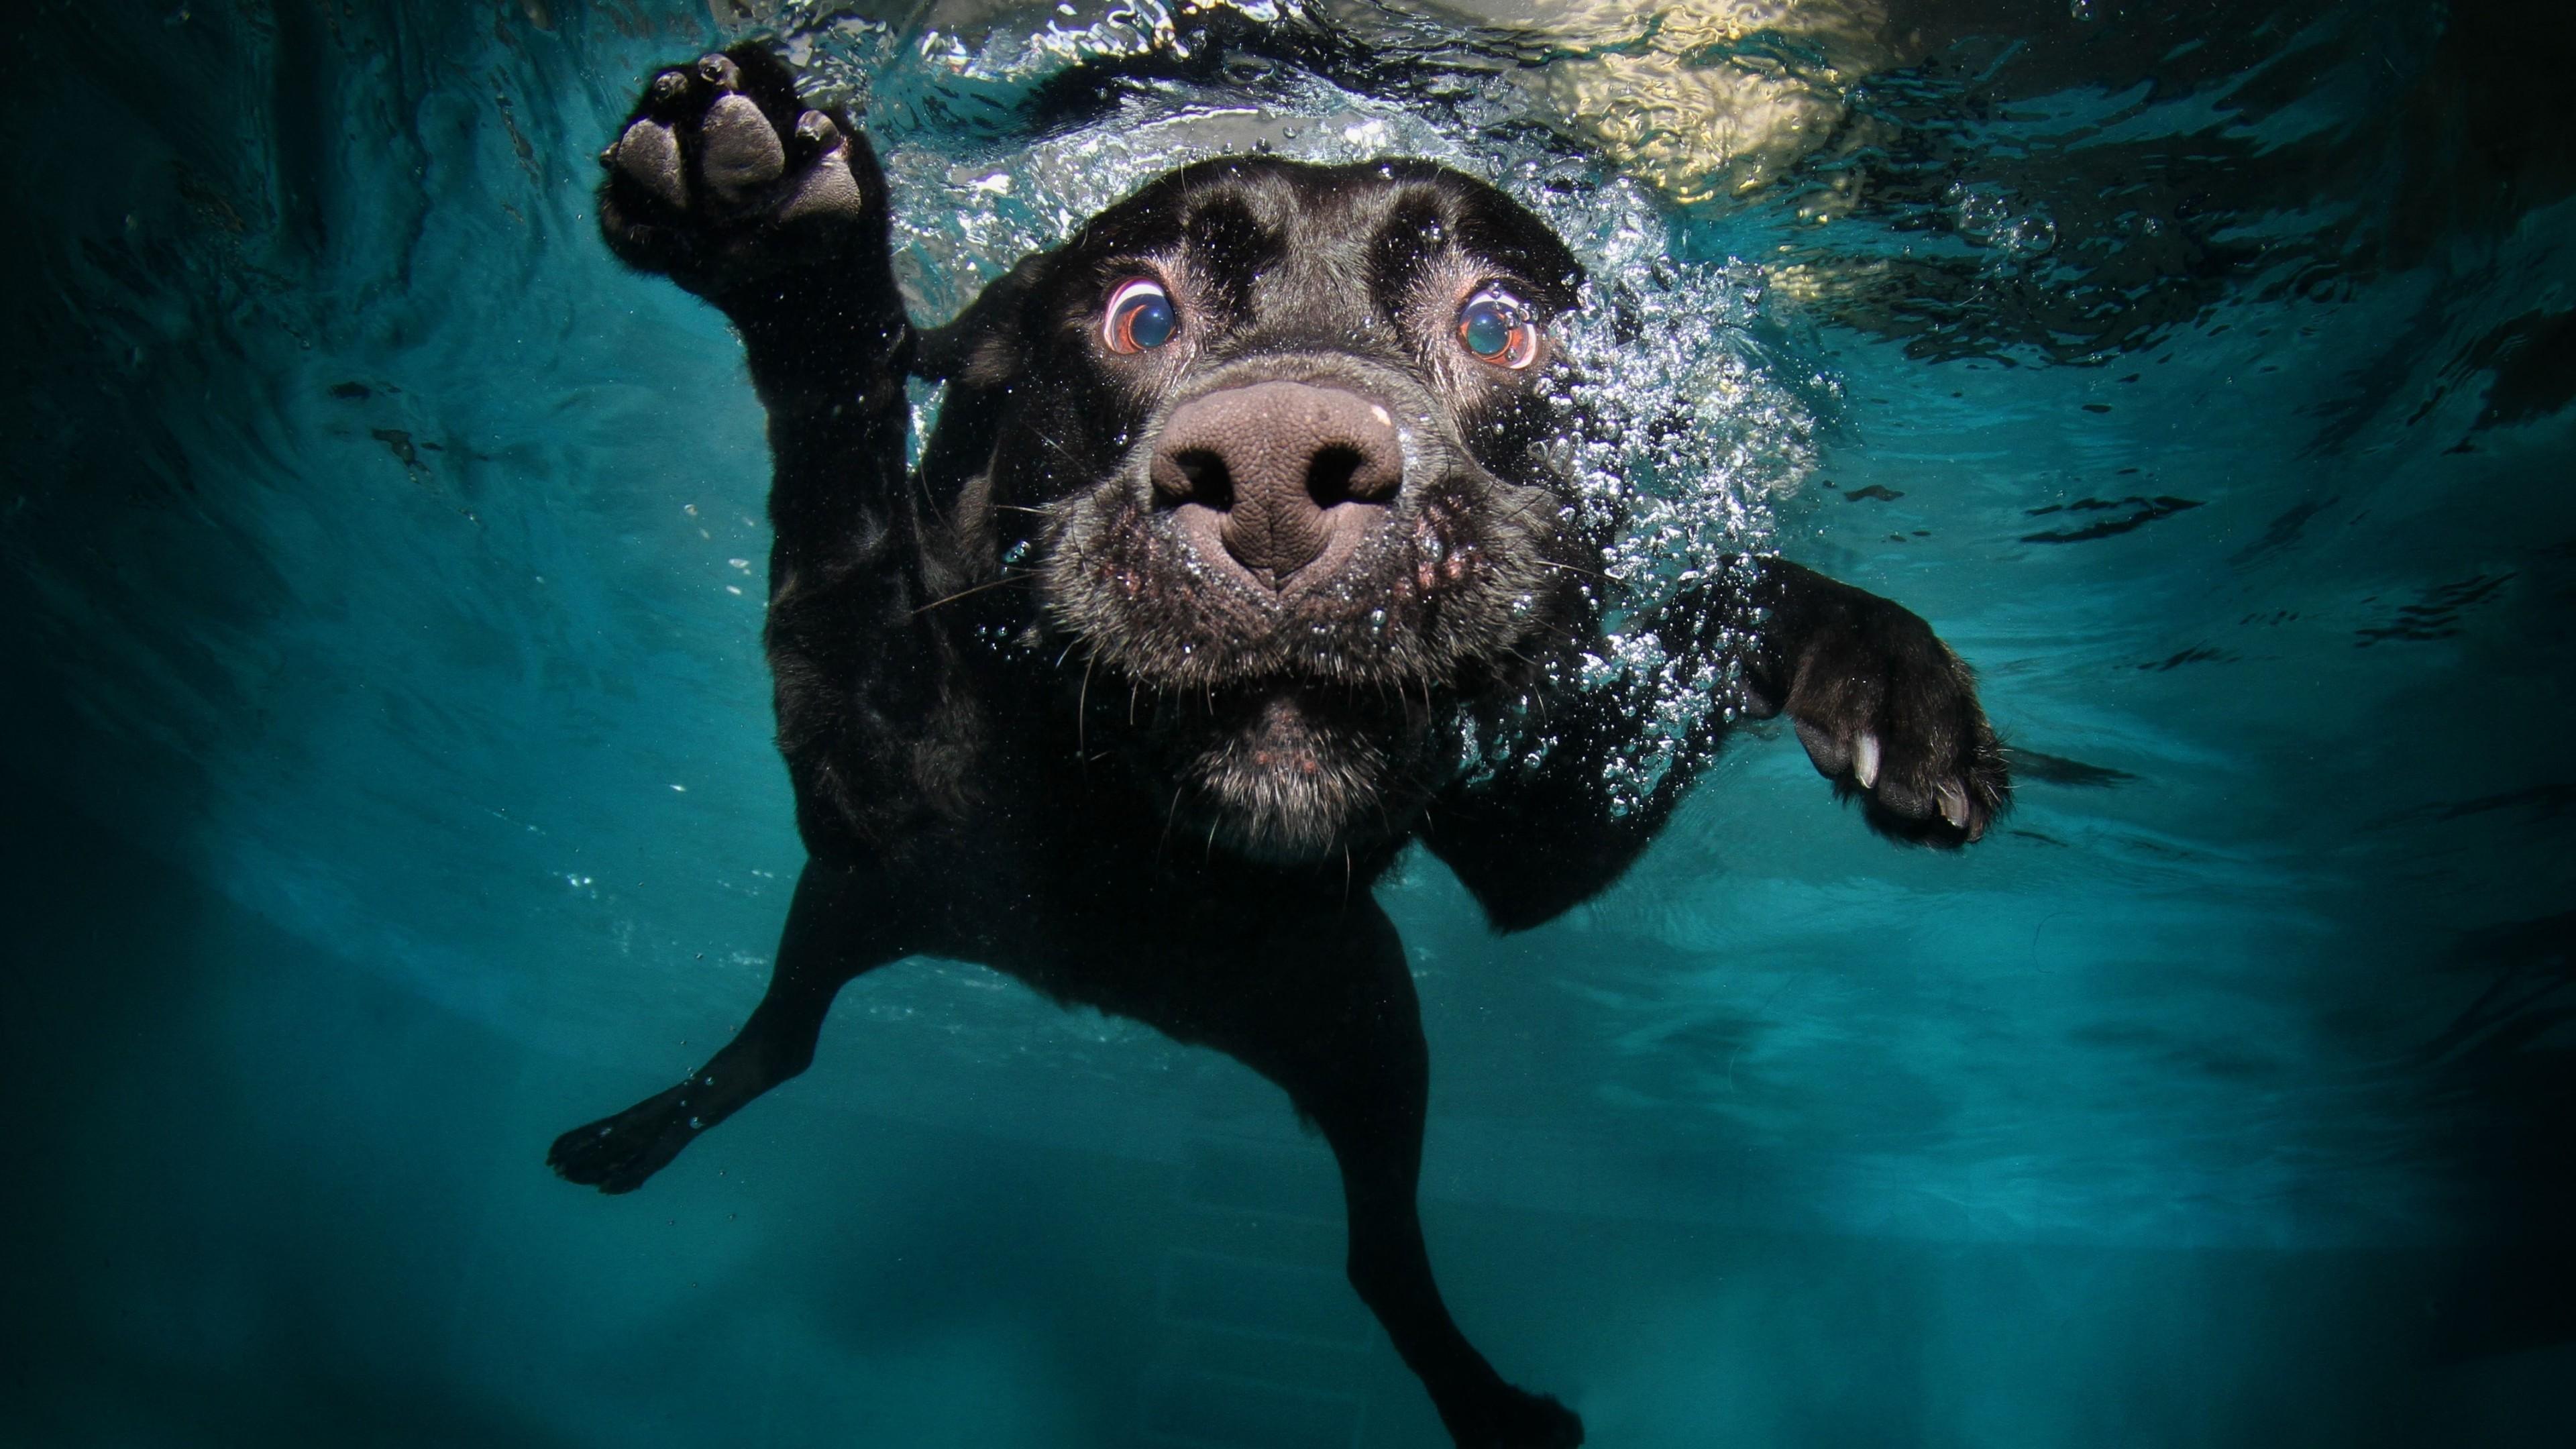 Wallpaper Dog 5k 4k Puppy Black Underwater Funny